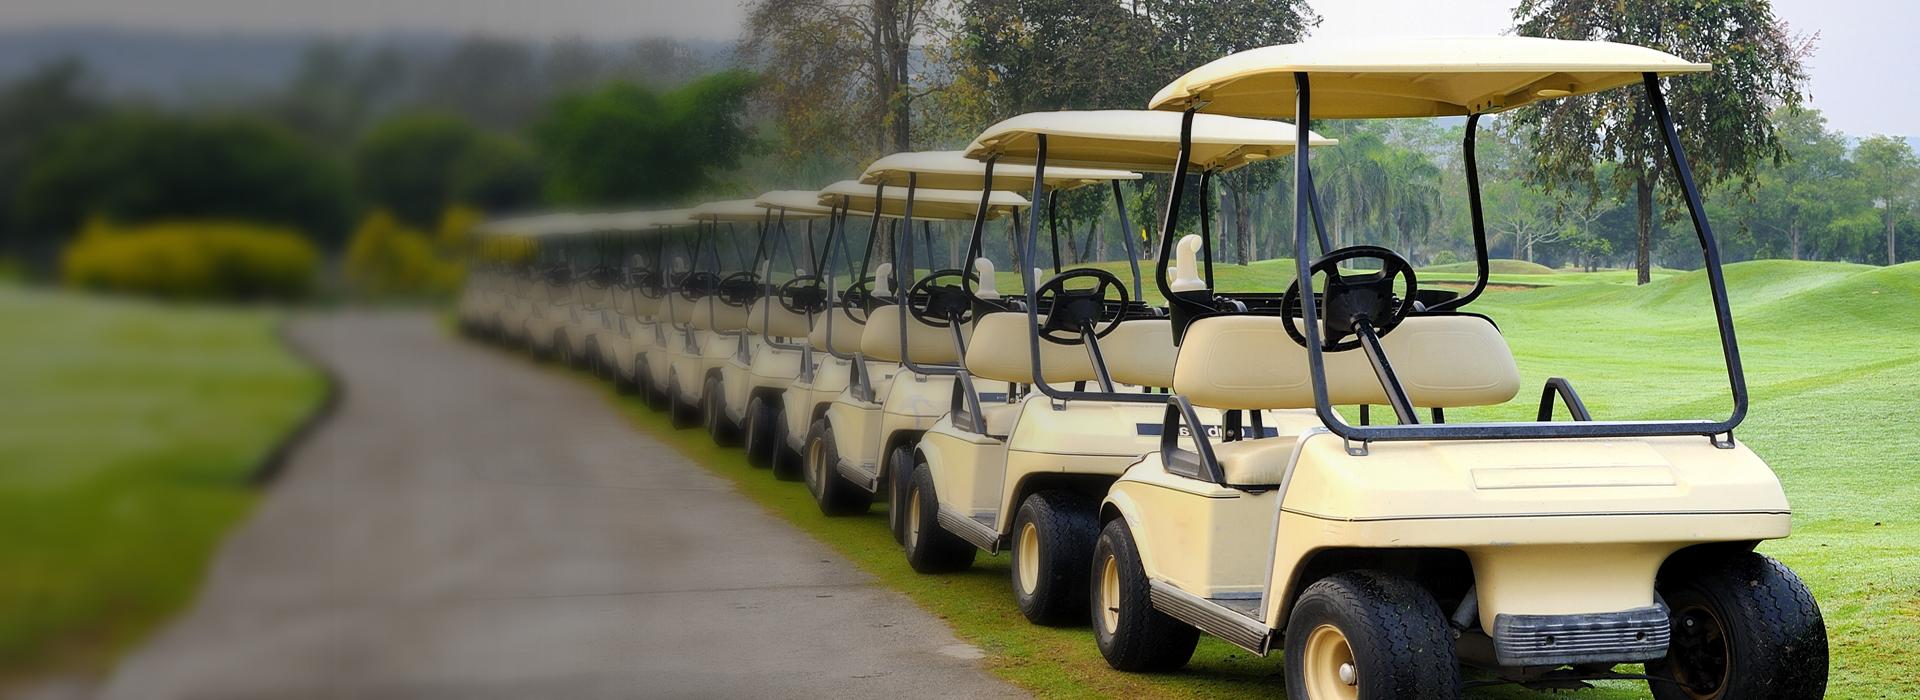 Golf_Carts_B